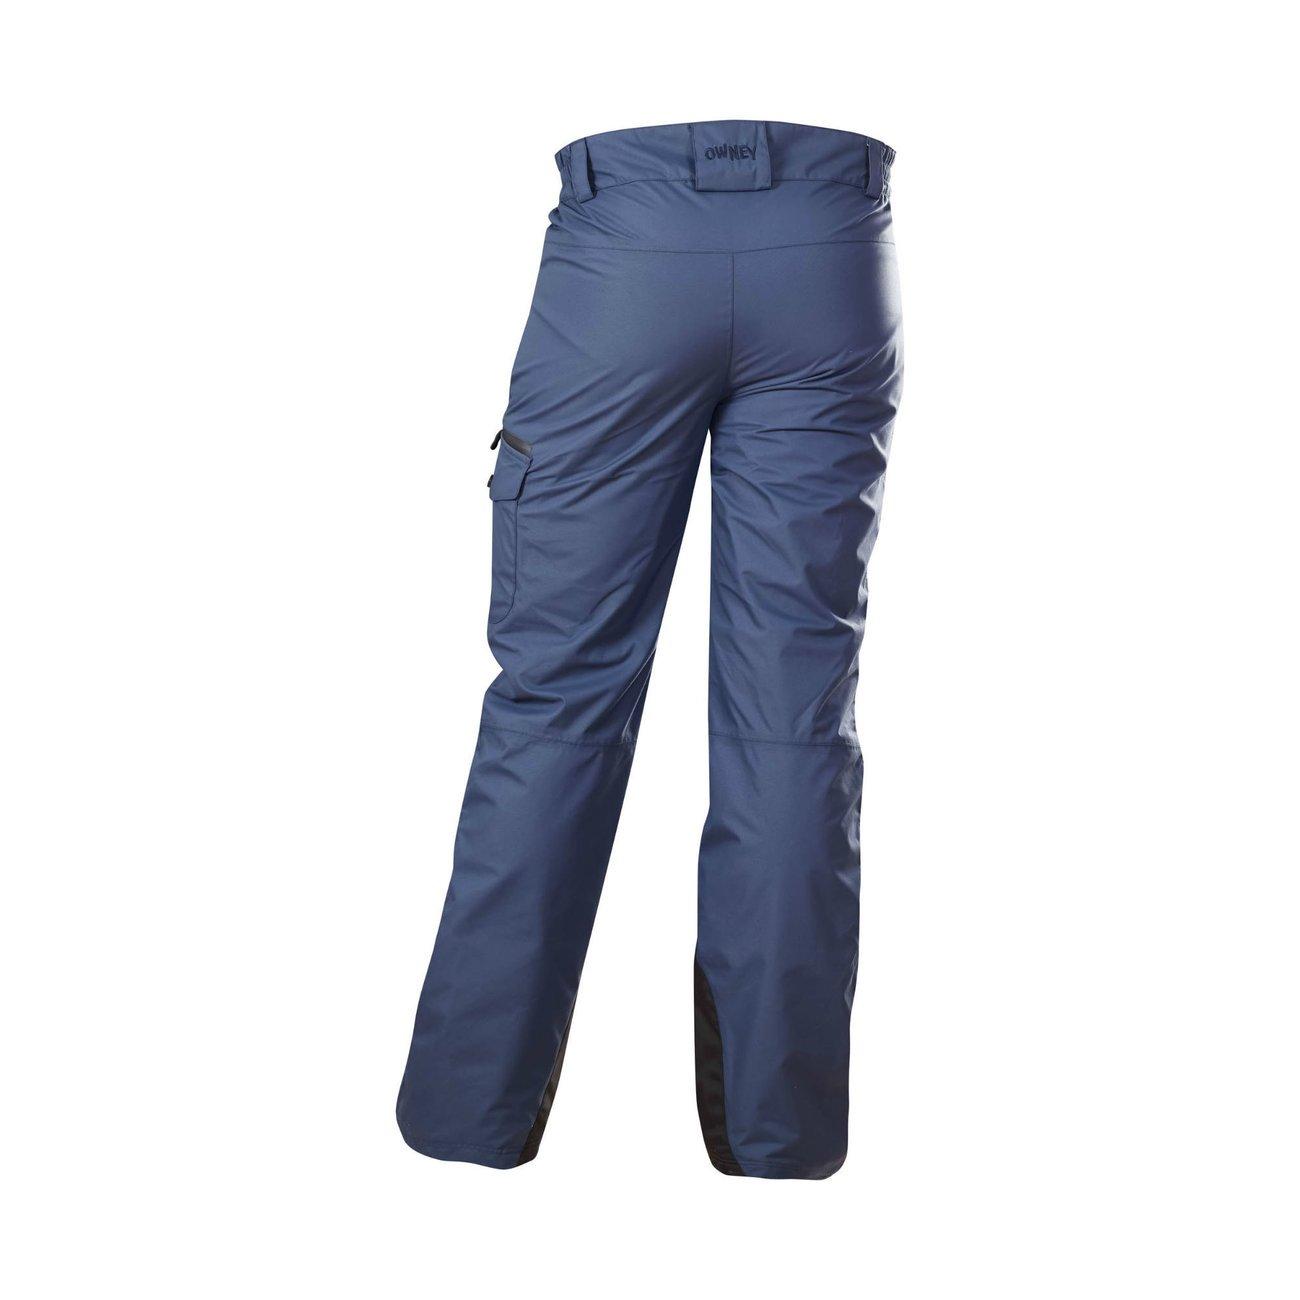 Owney Outdoor Herrenhose YUKON Pants, Bild 2